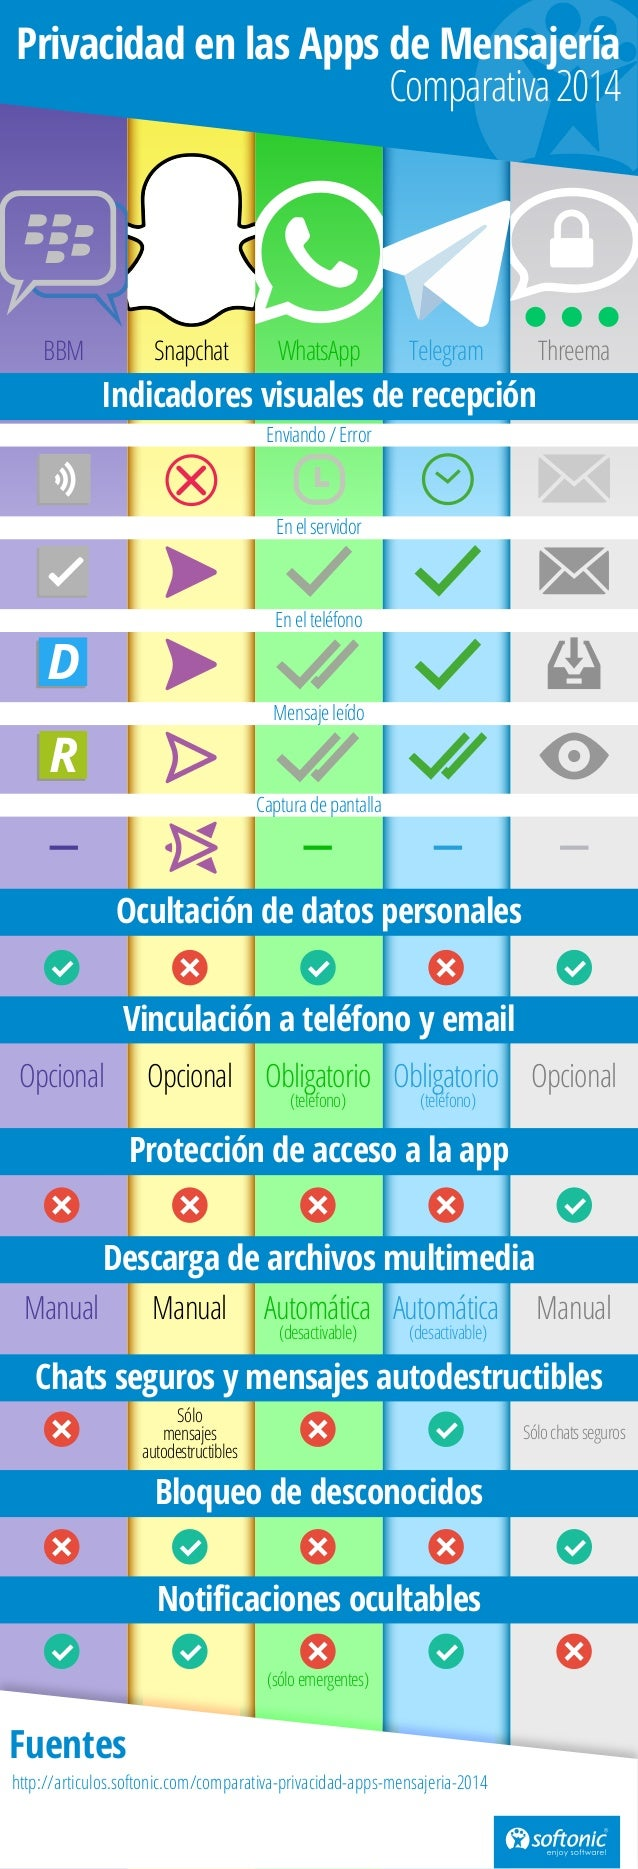 BBM Snapchat WhatsApp Telegram Threema D R Opcional ObligatorioObligatorioOpcional Opcional (teléfono) (teléfono) Manual A...